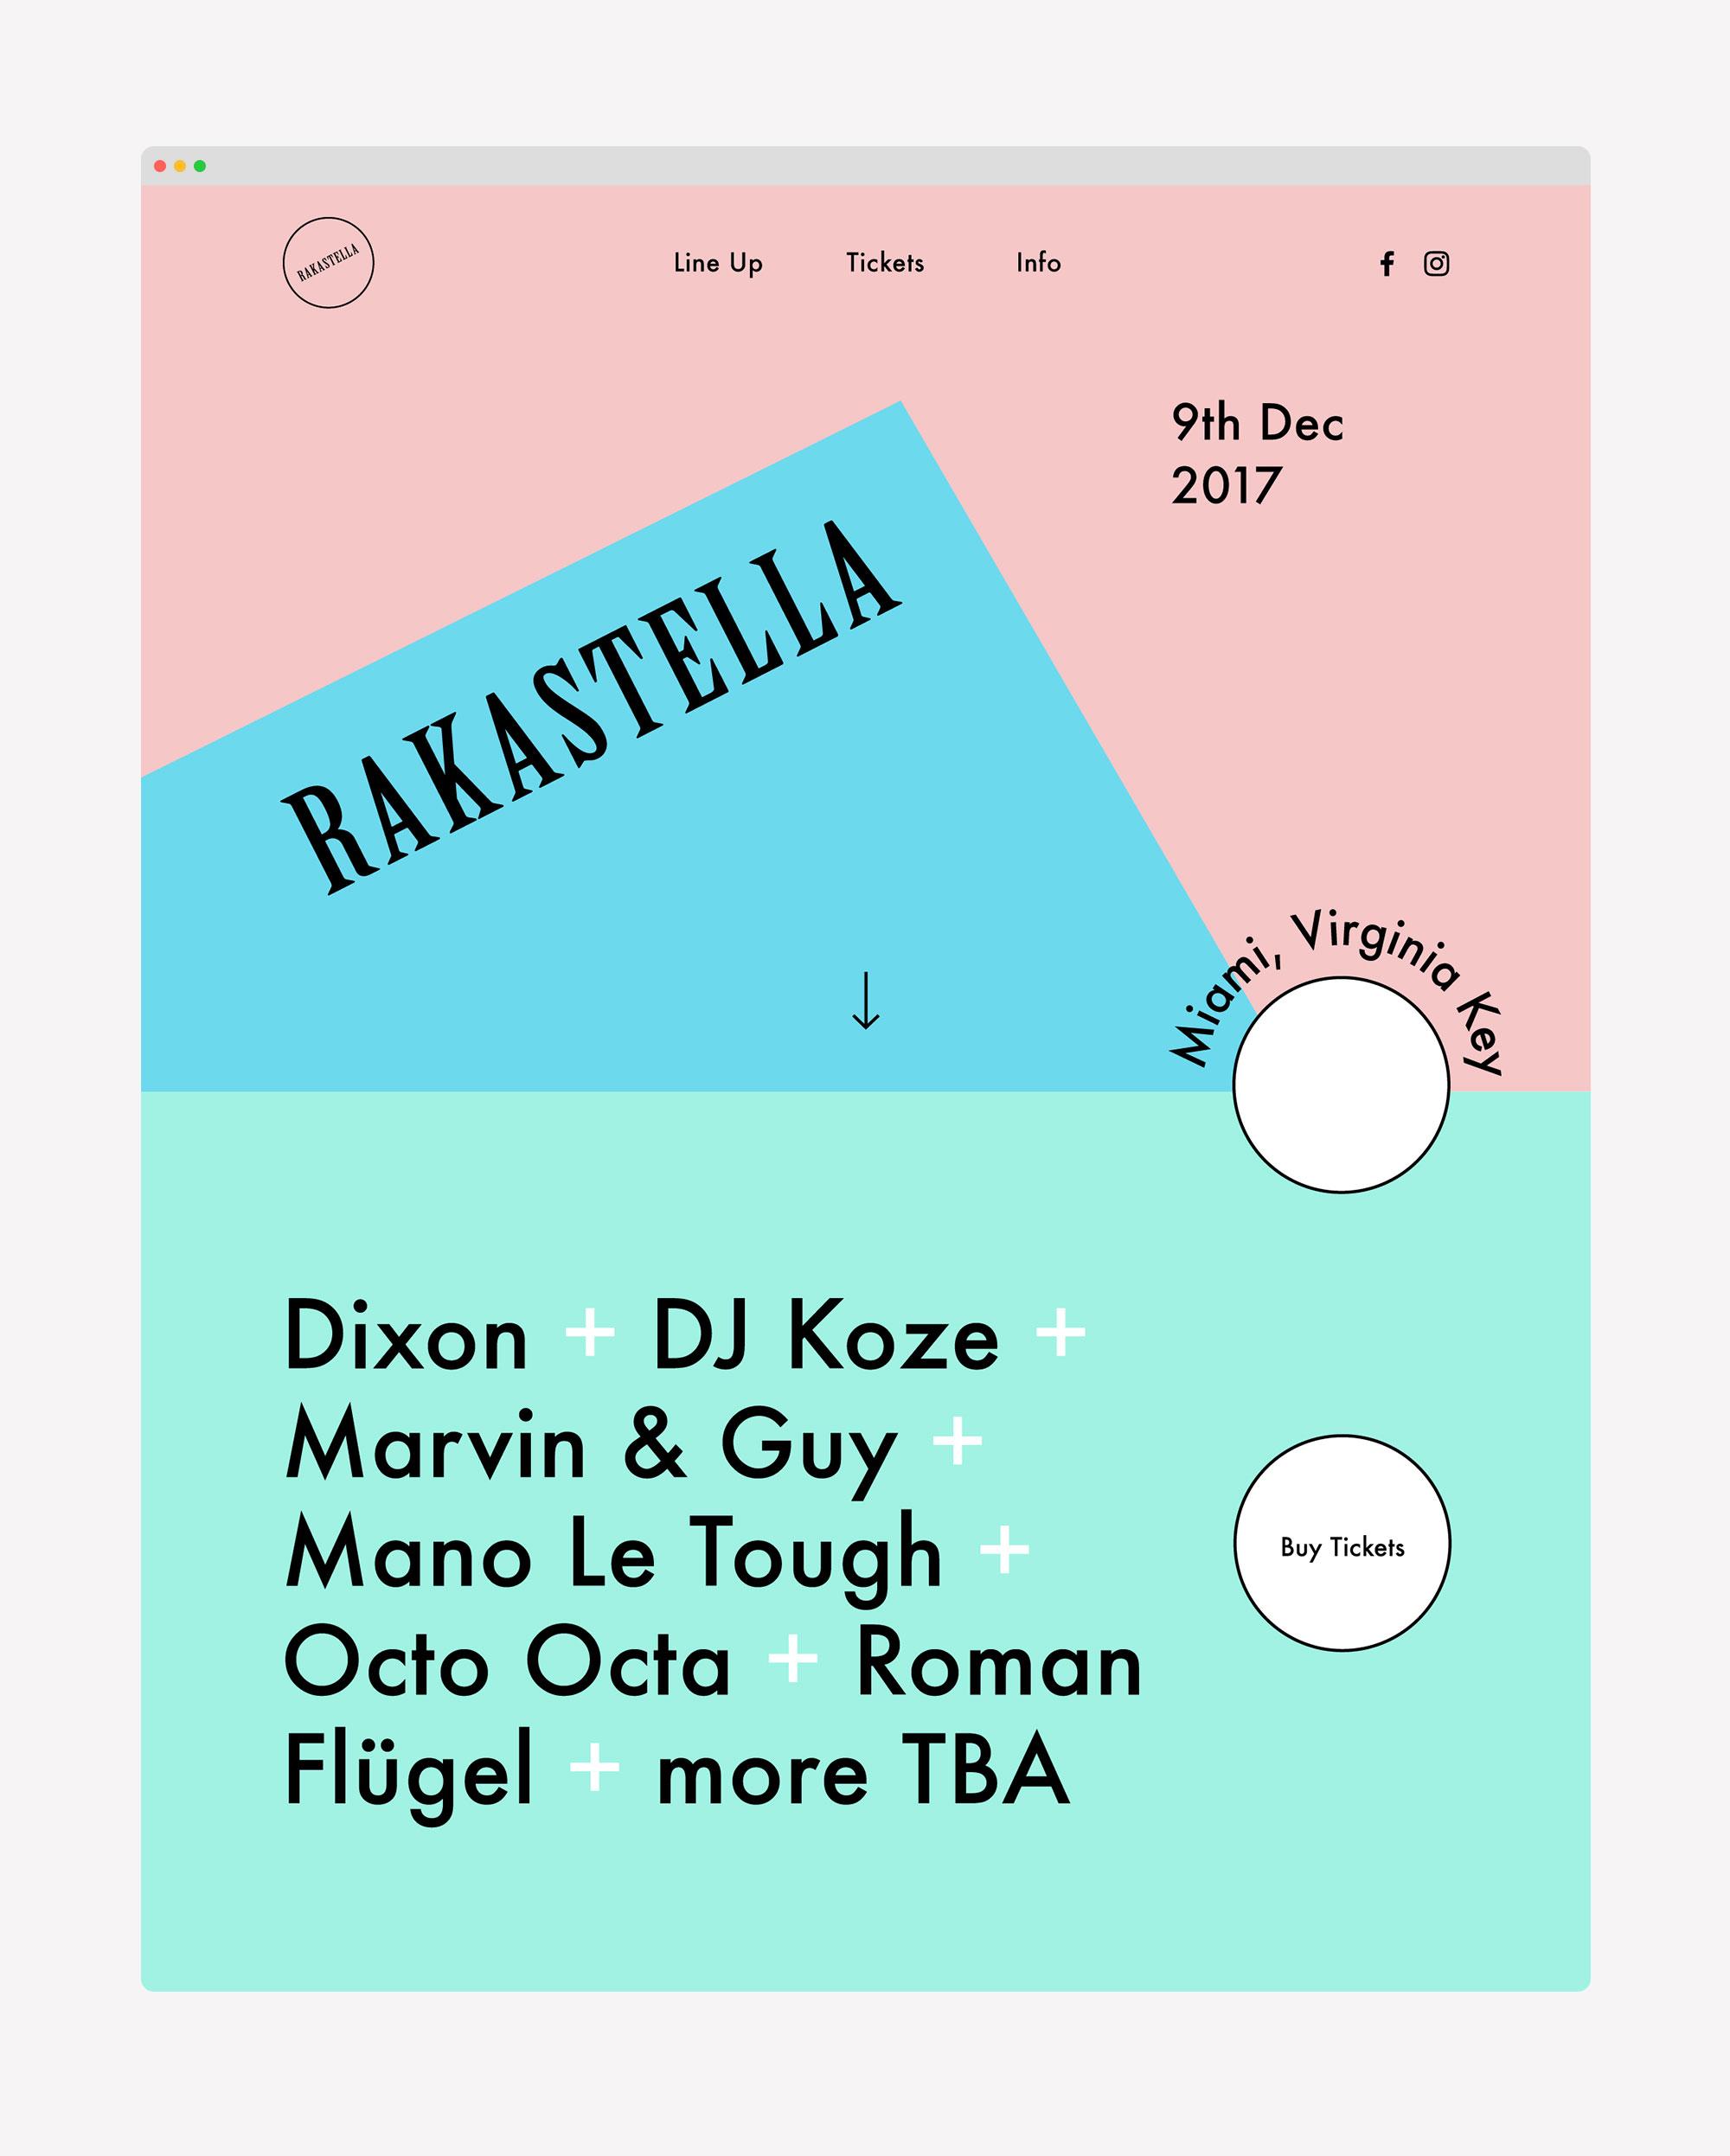 Rakastella-website1.jpg